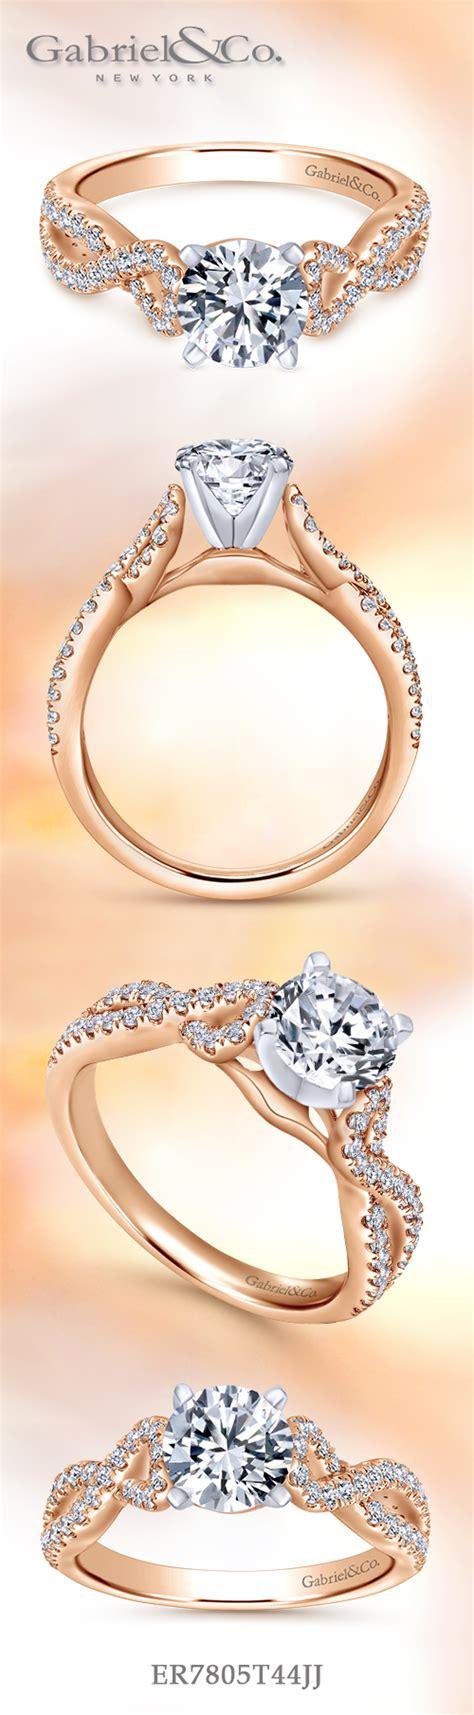 Ac 8457 Rosegold gabriel co voted 1 most preferred bridal brand